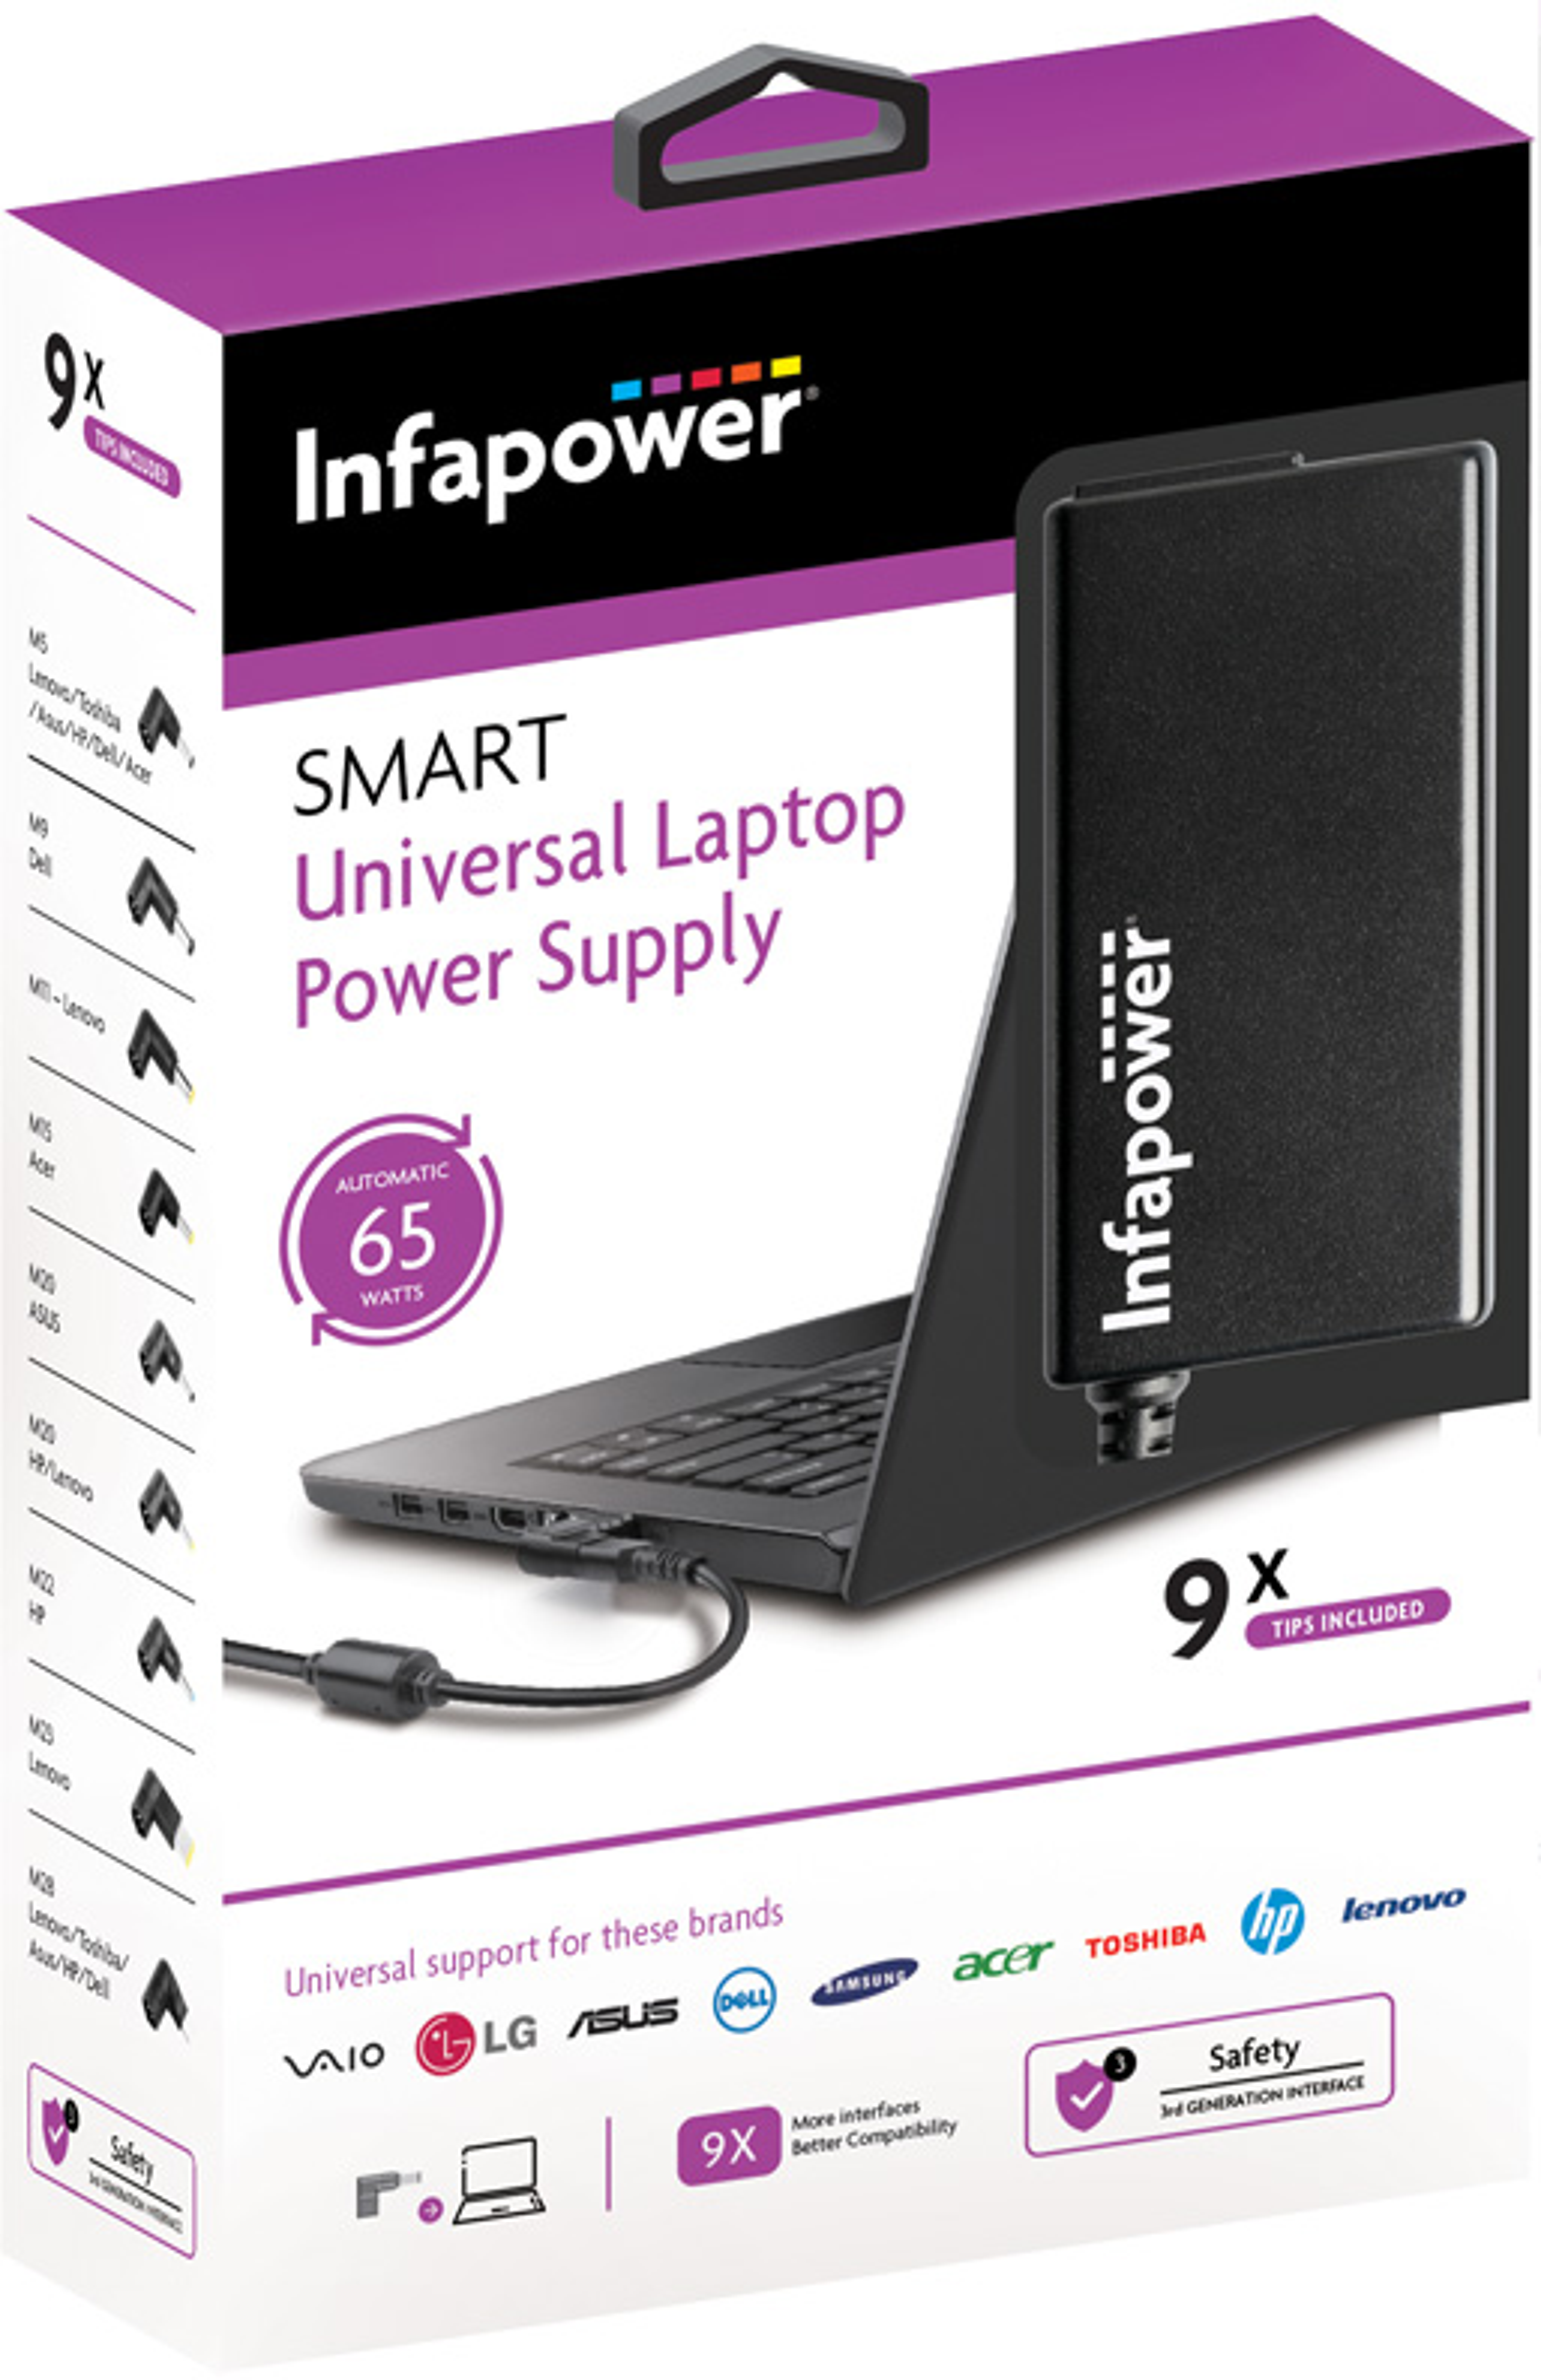 P033: 65W Universal Laptop Power Supply